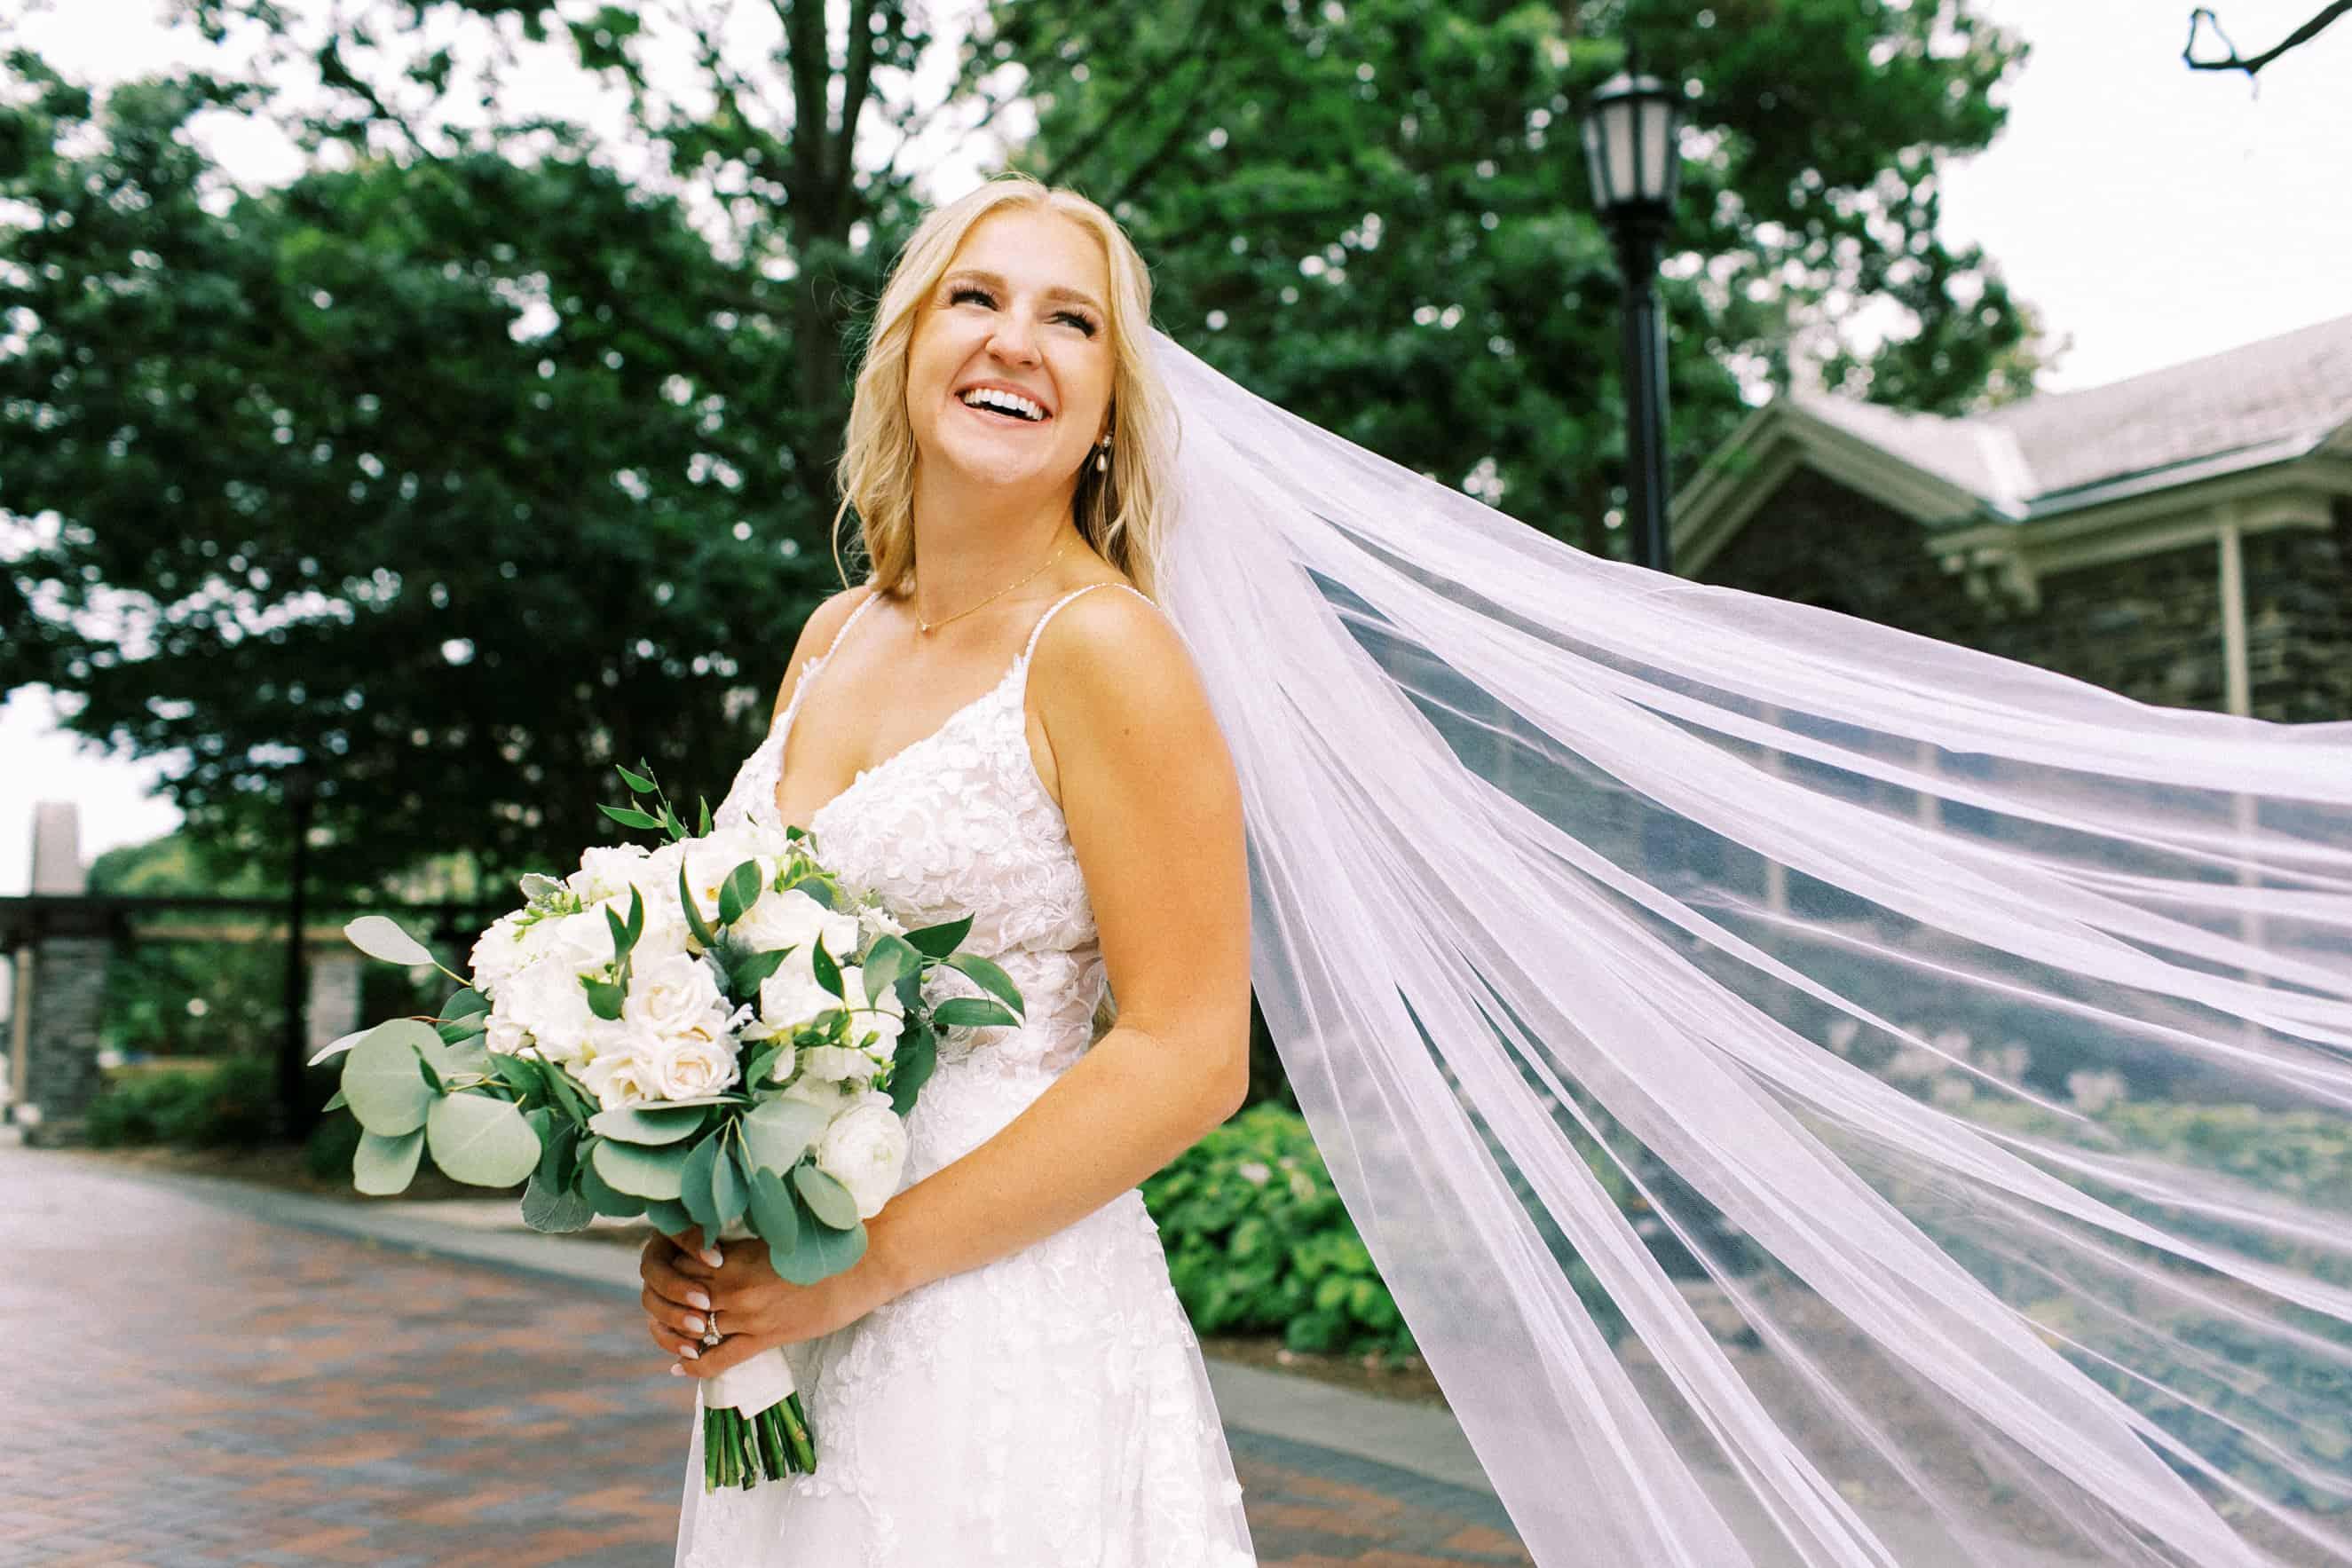 Wedding photos at Villanova University